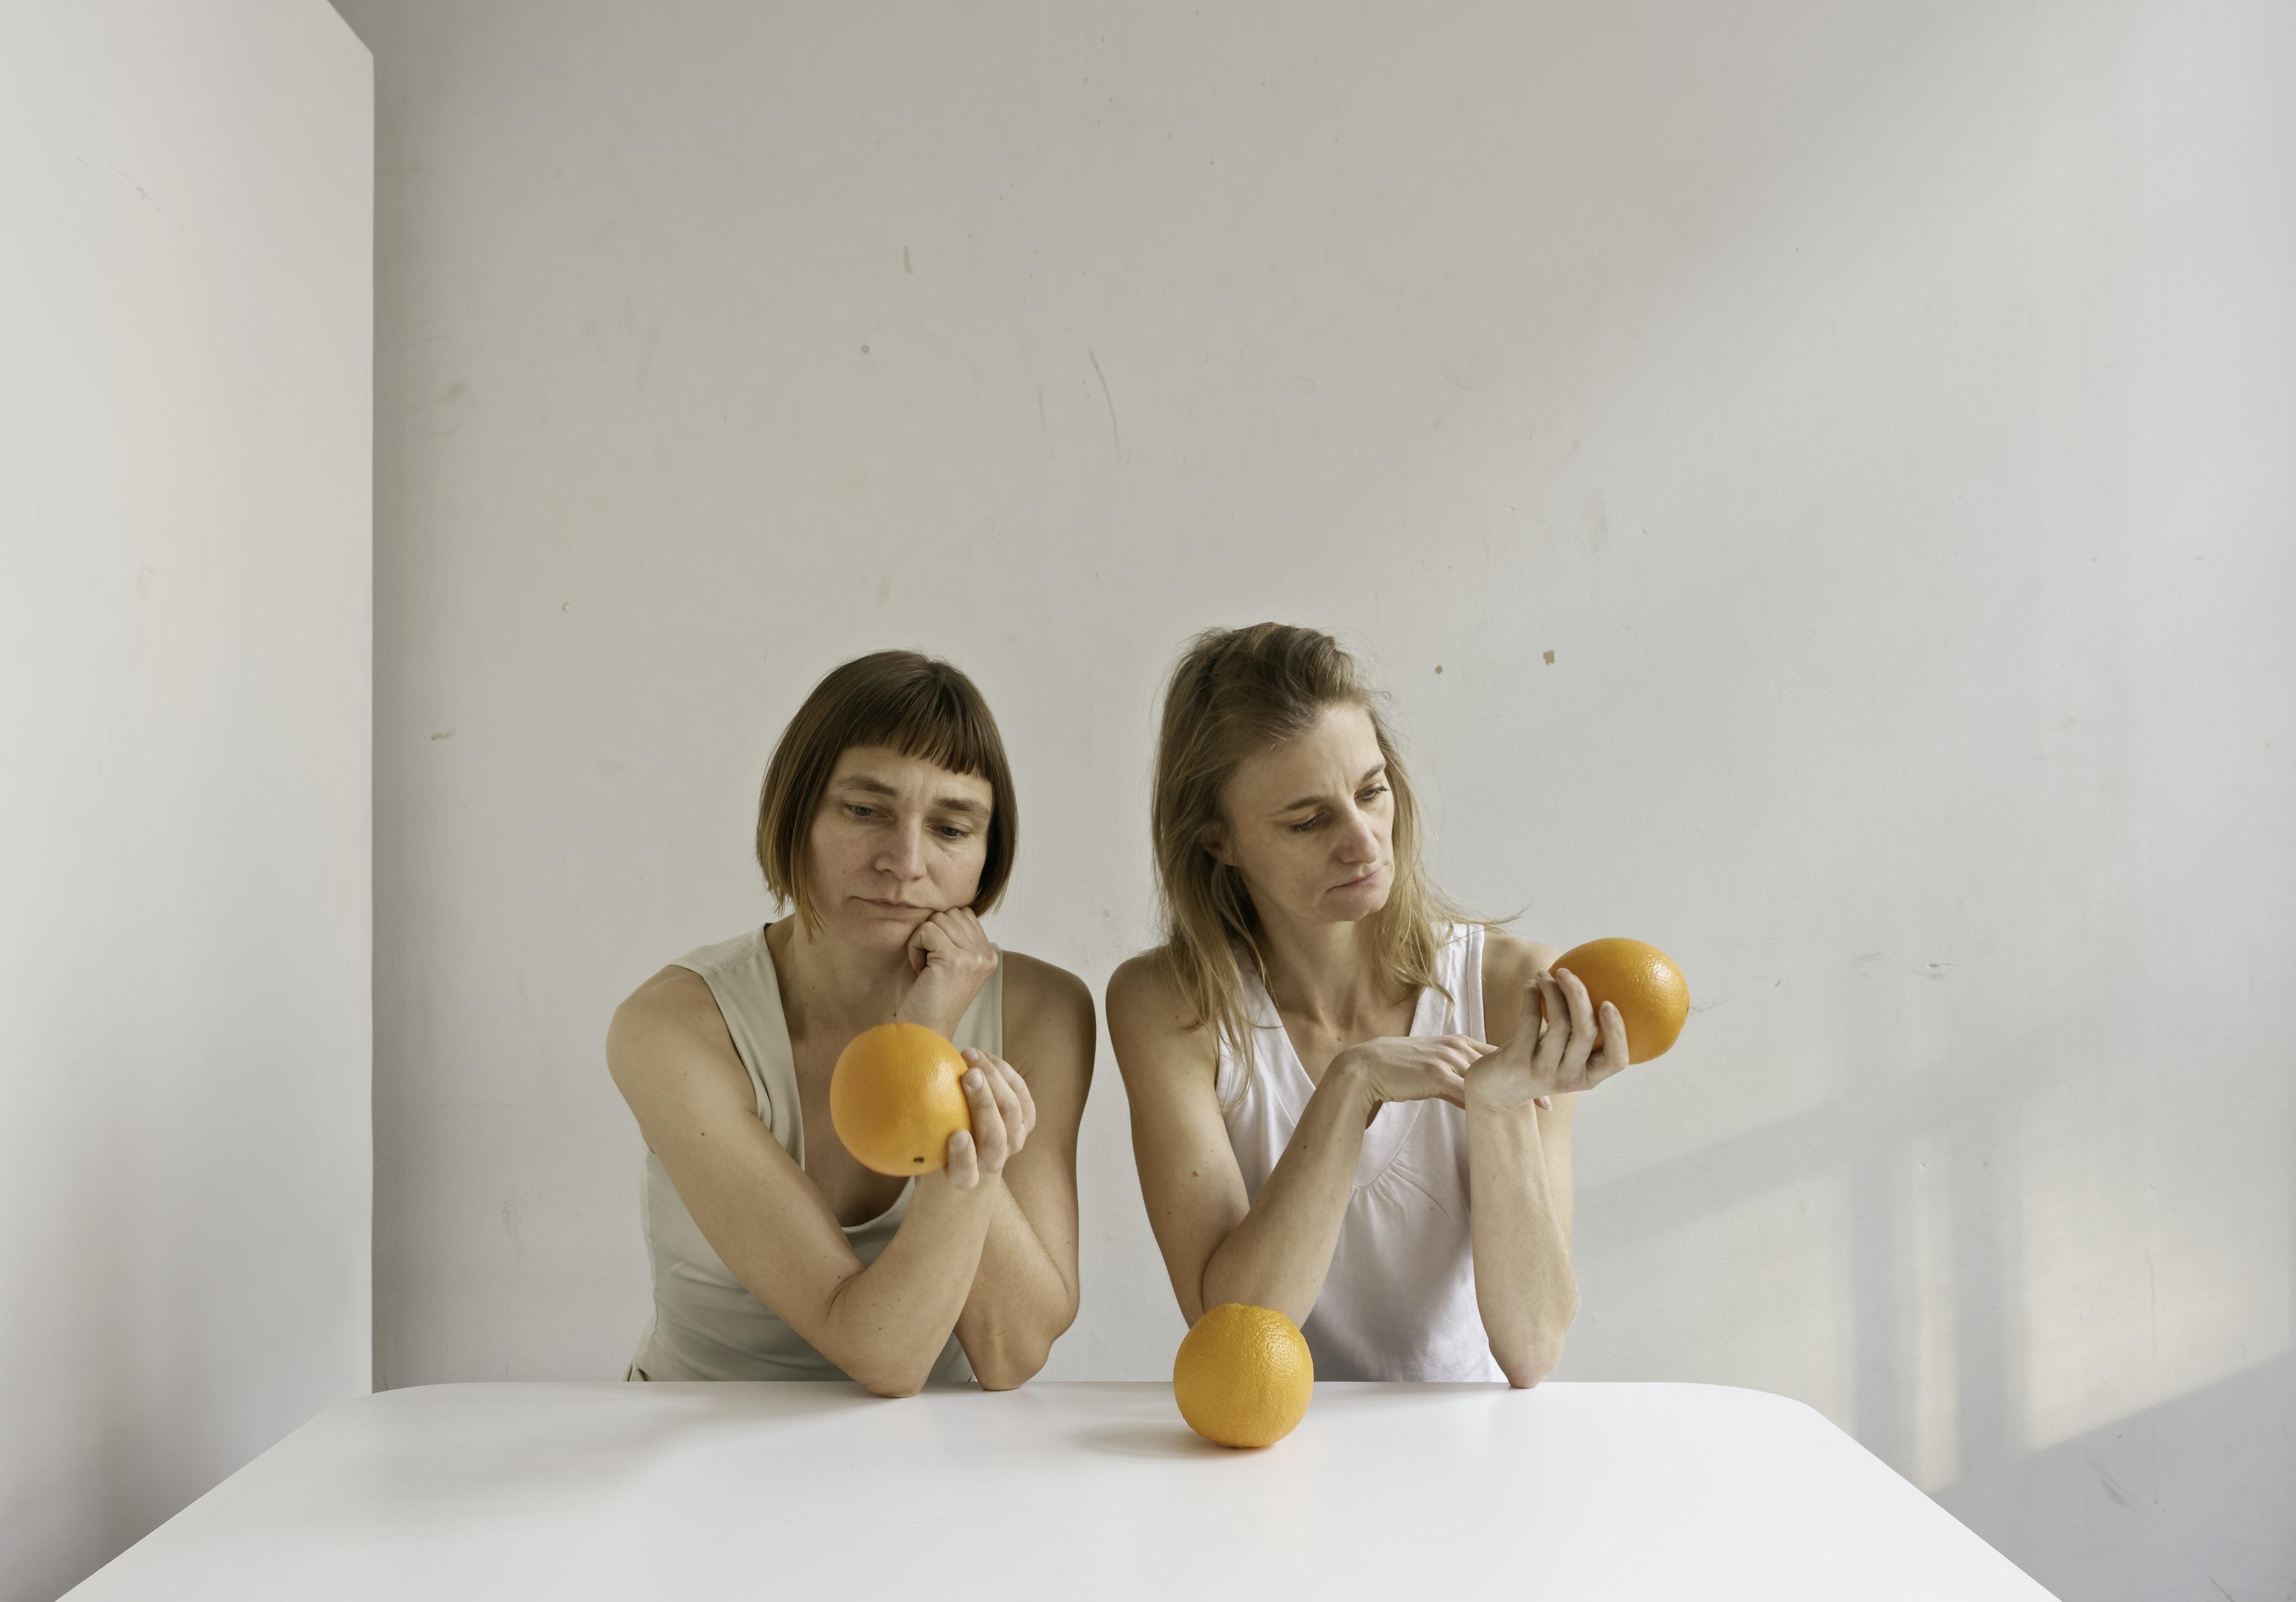 Elina Brotherus: Orange Event (2017)